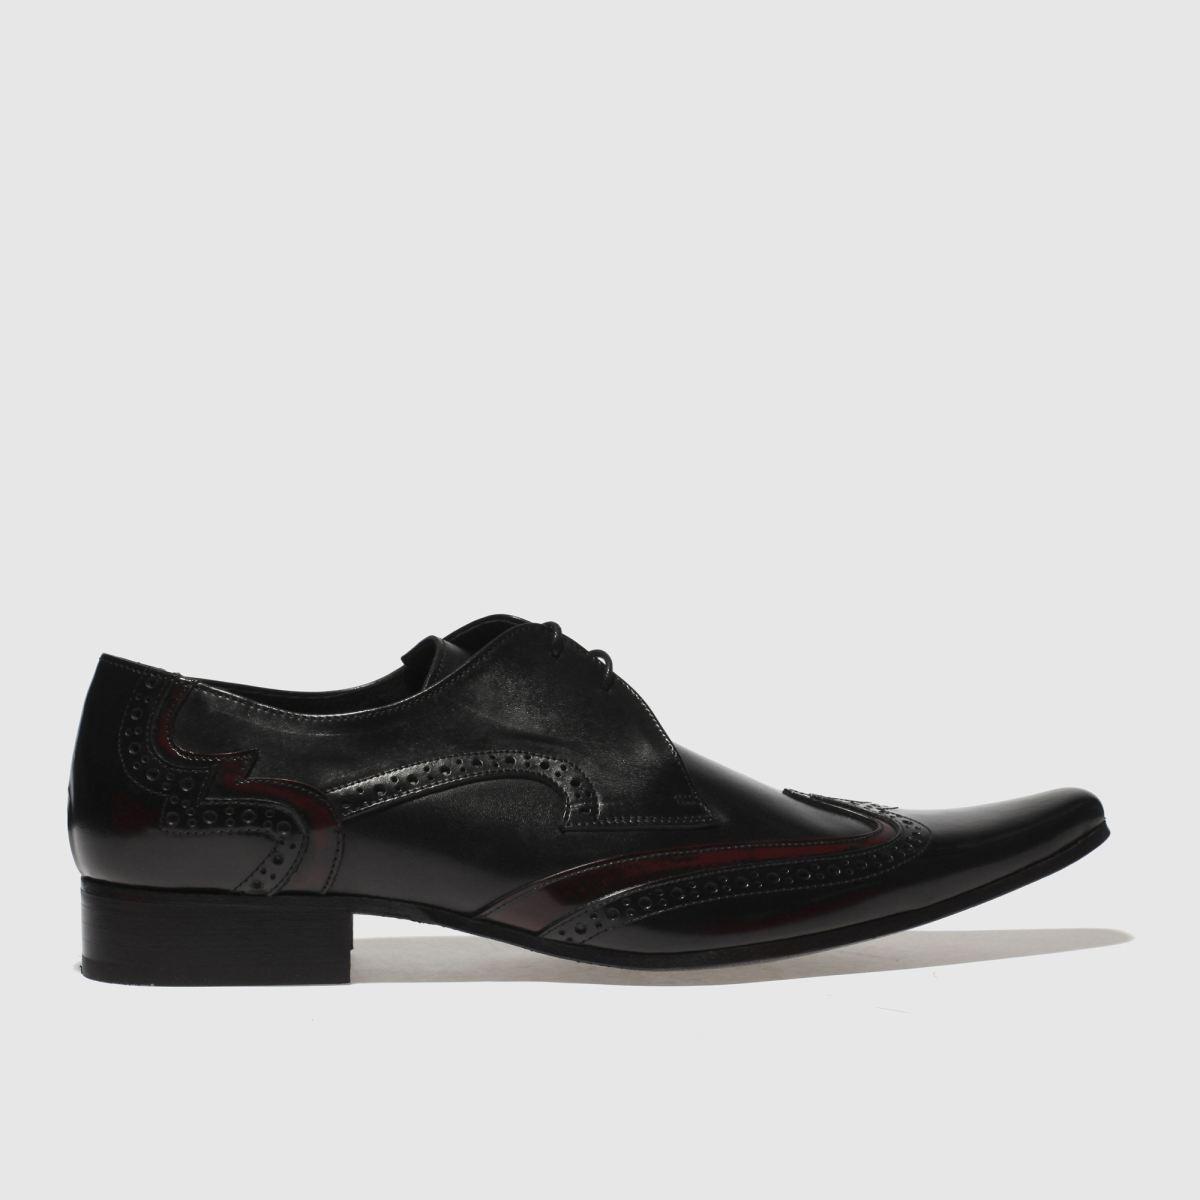 Jeffery West Black Pino Brogue Shoes